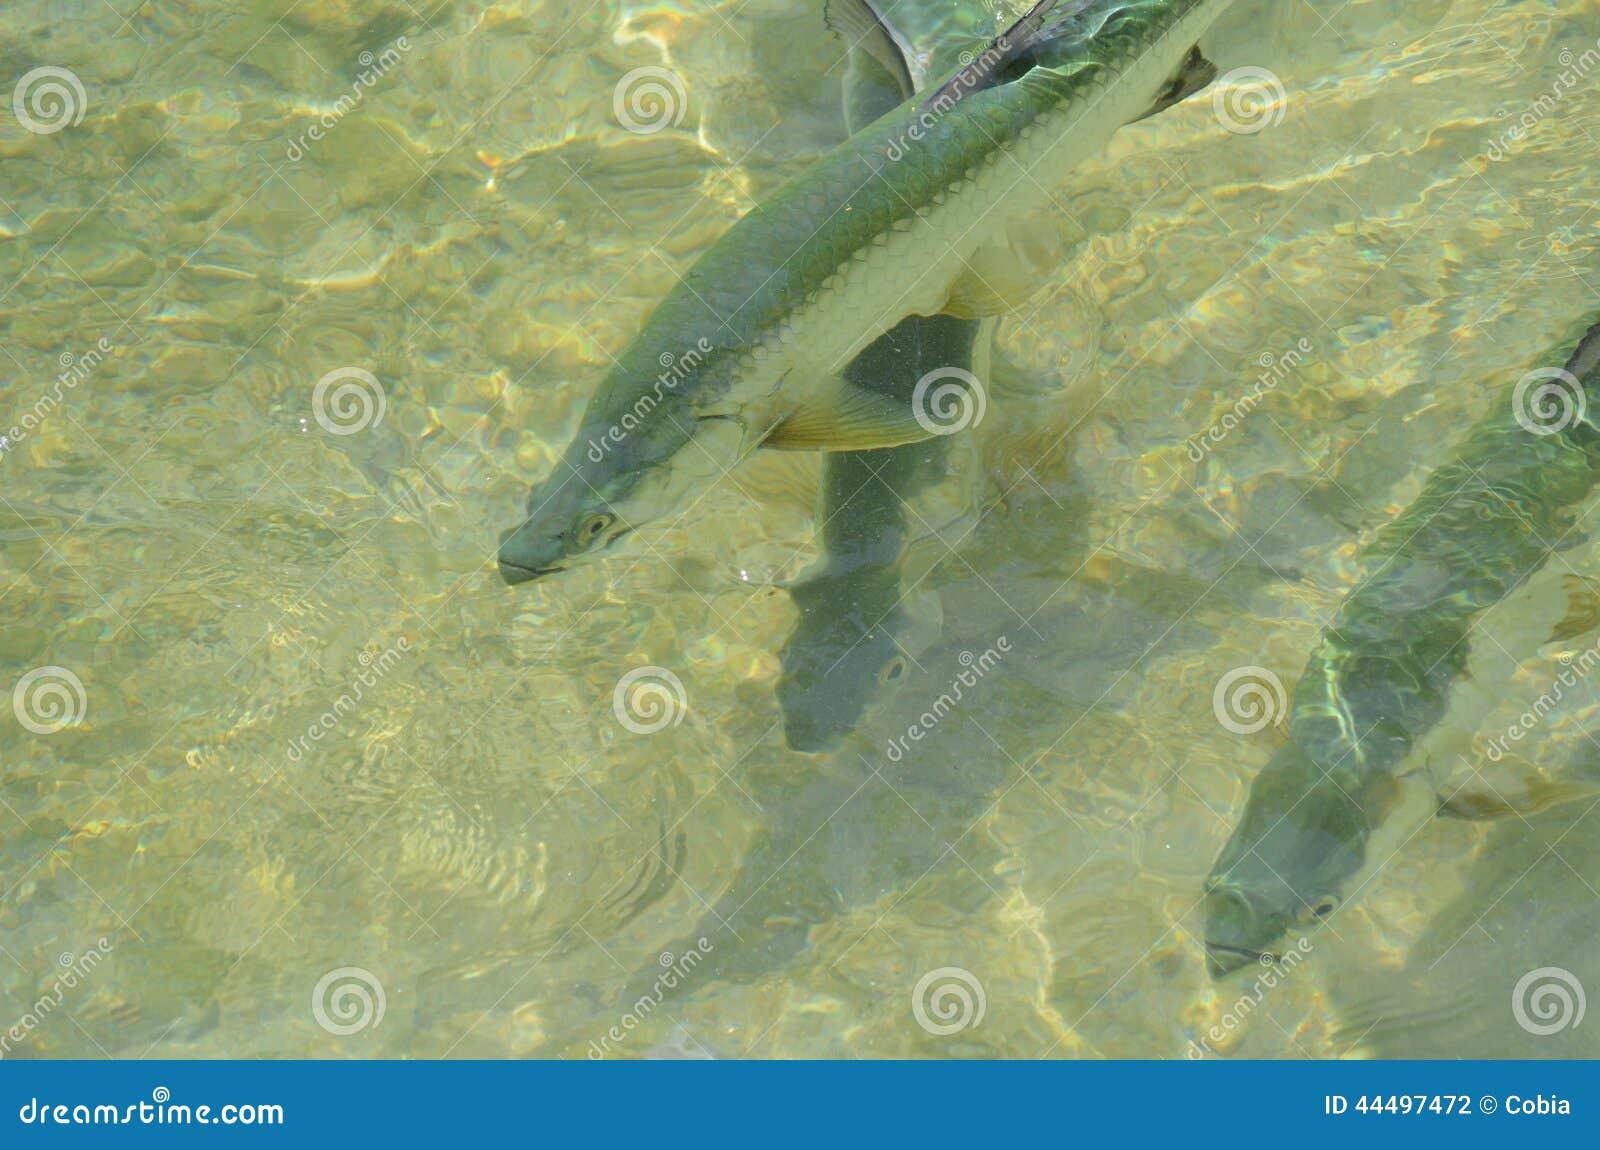 Tarpons (Megalops atlanticus) in shallow waters